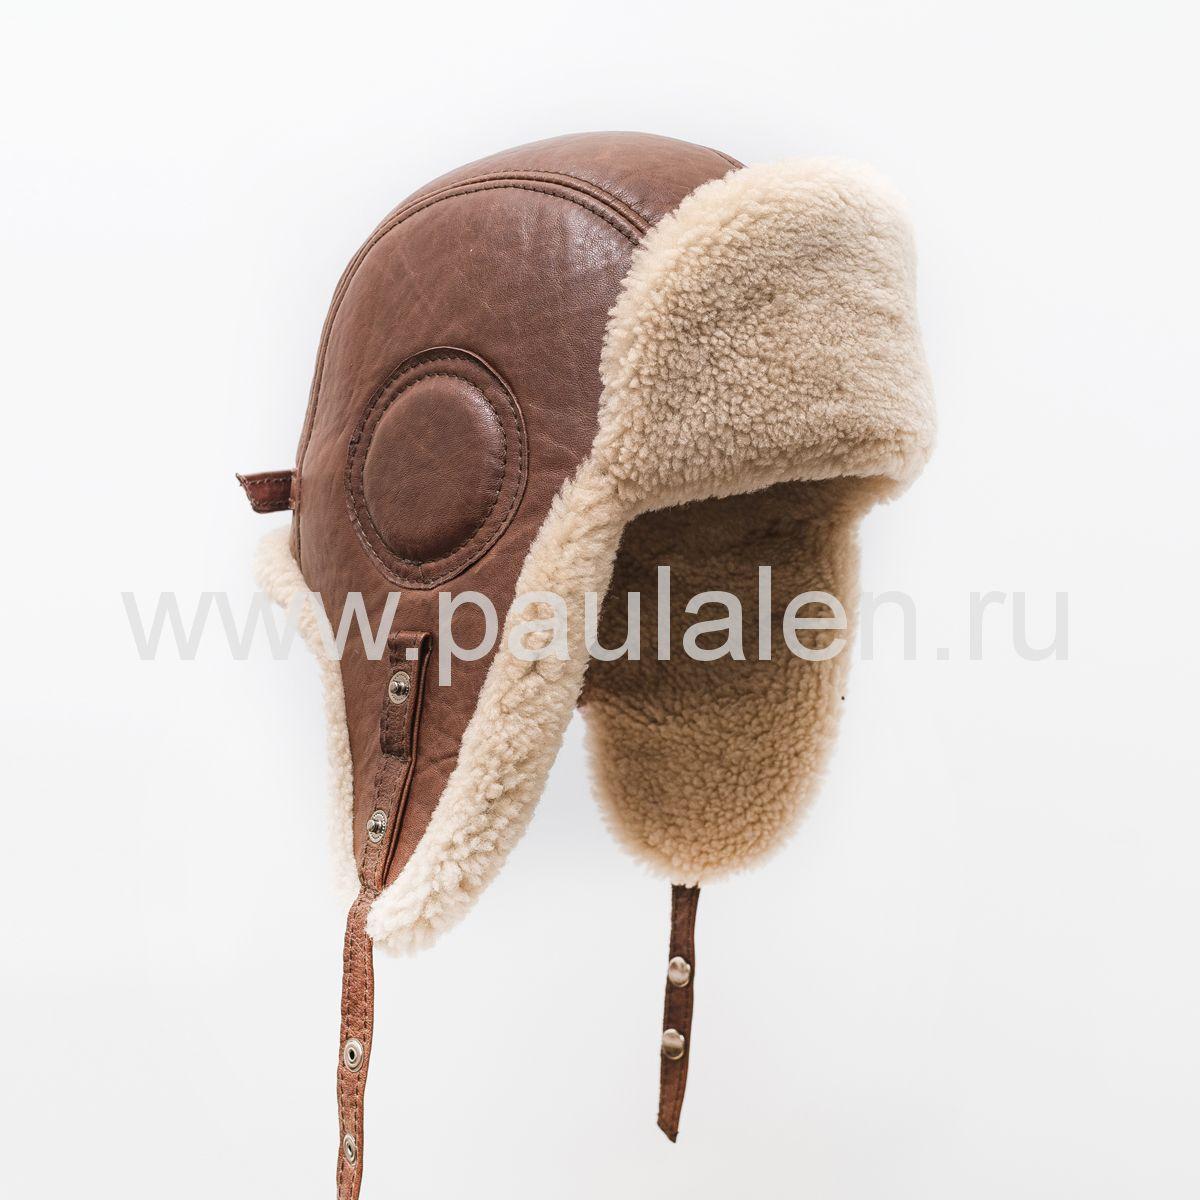 "Мужская шапка ушанка ""Авиатор"" из кожи и меха овчины. Артикул B031"